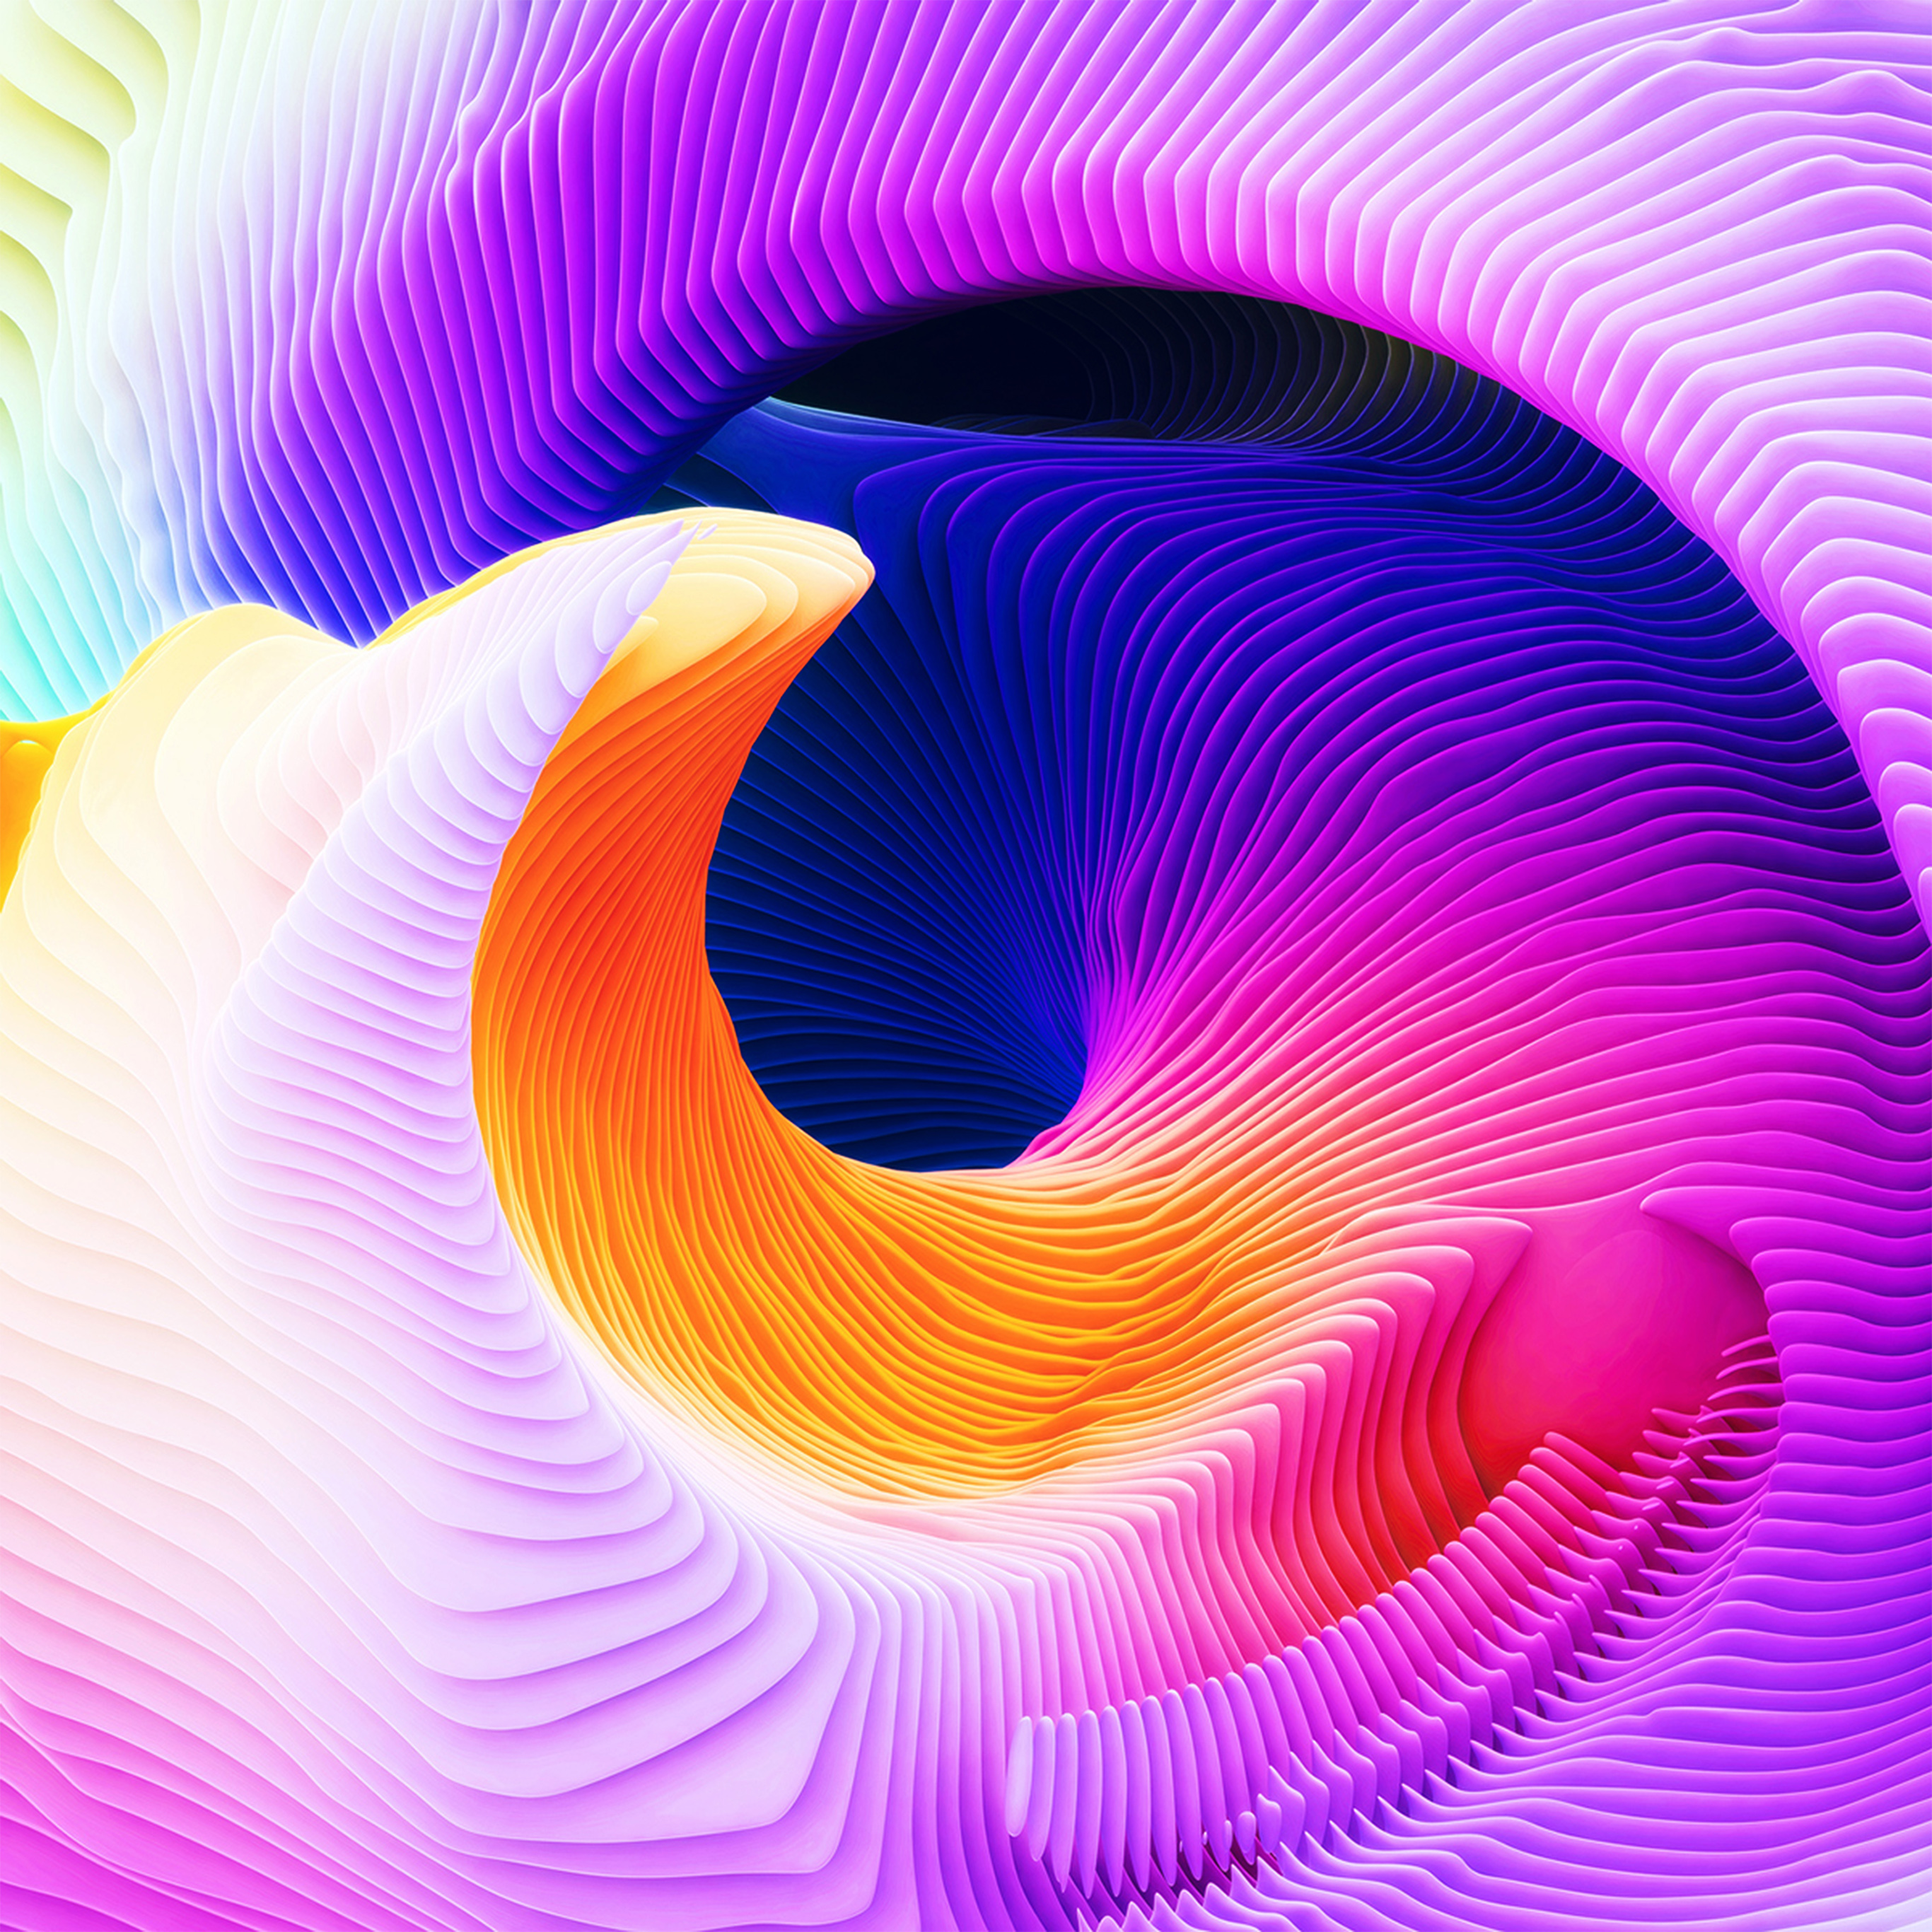 Vl82-abstract-color-art-free-purple-pattern-wallpaper